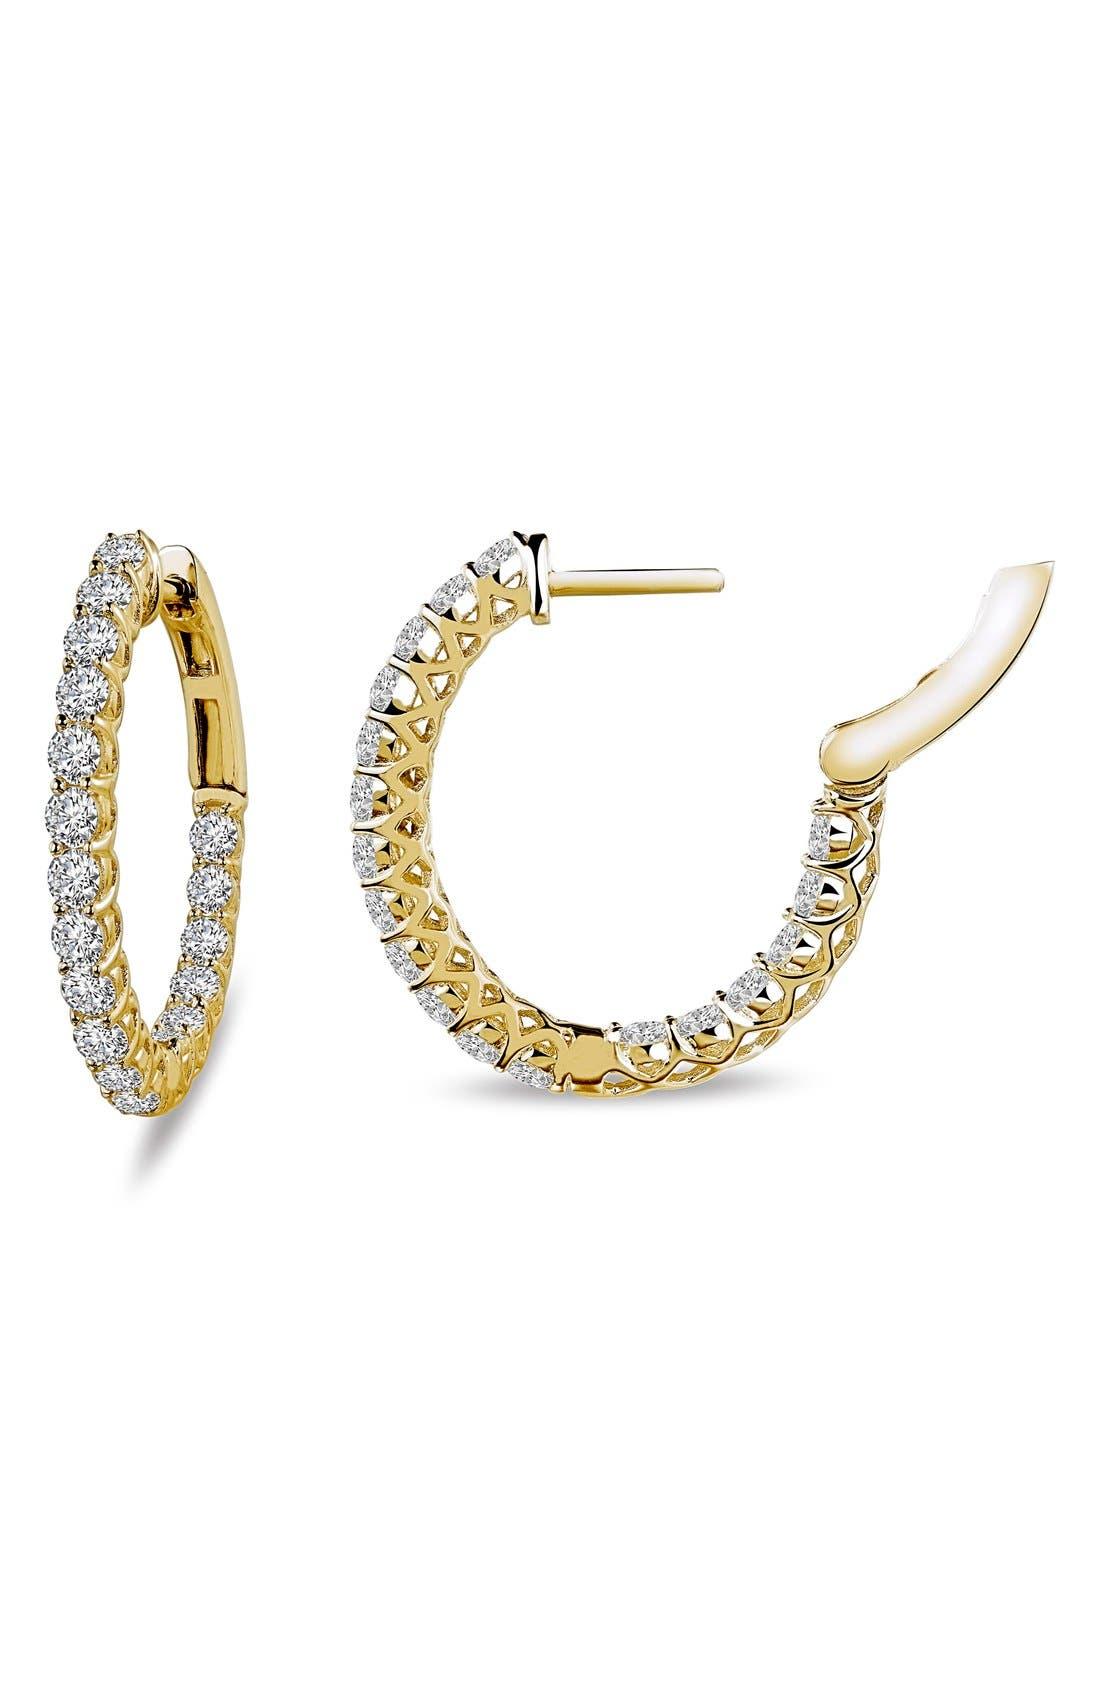 Main Image - Lafonn 'Lassaire' Hoop Earrings